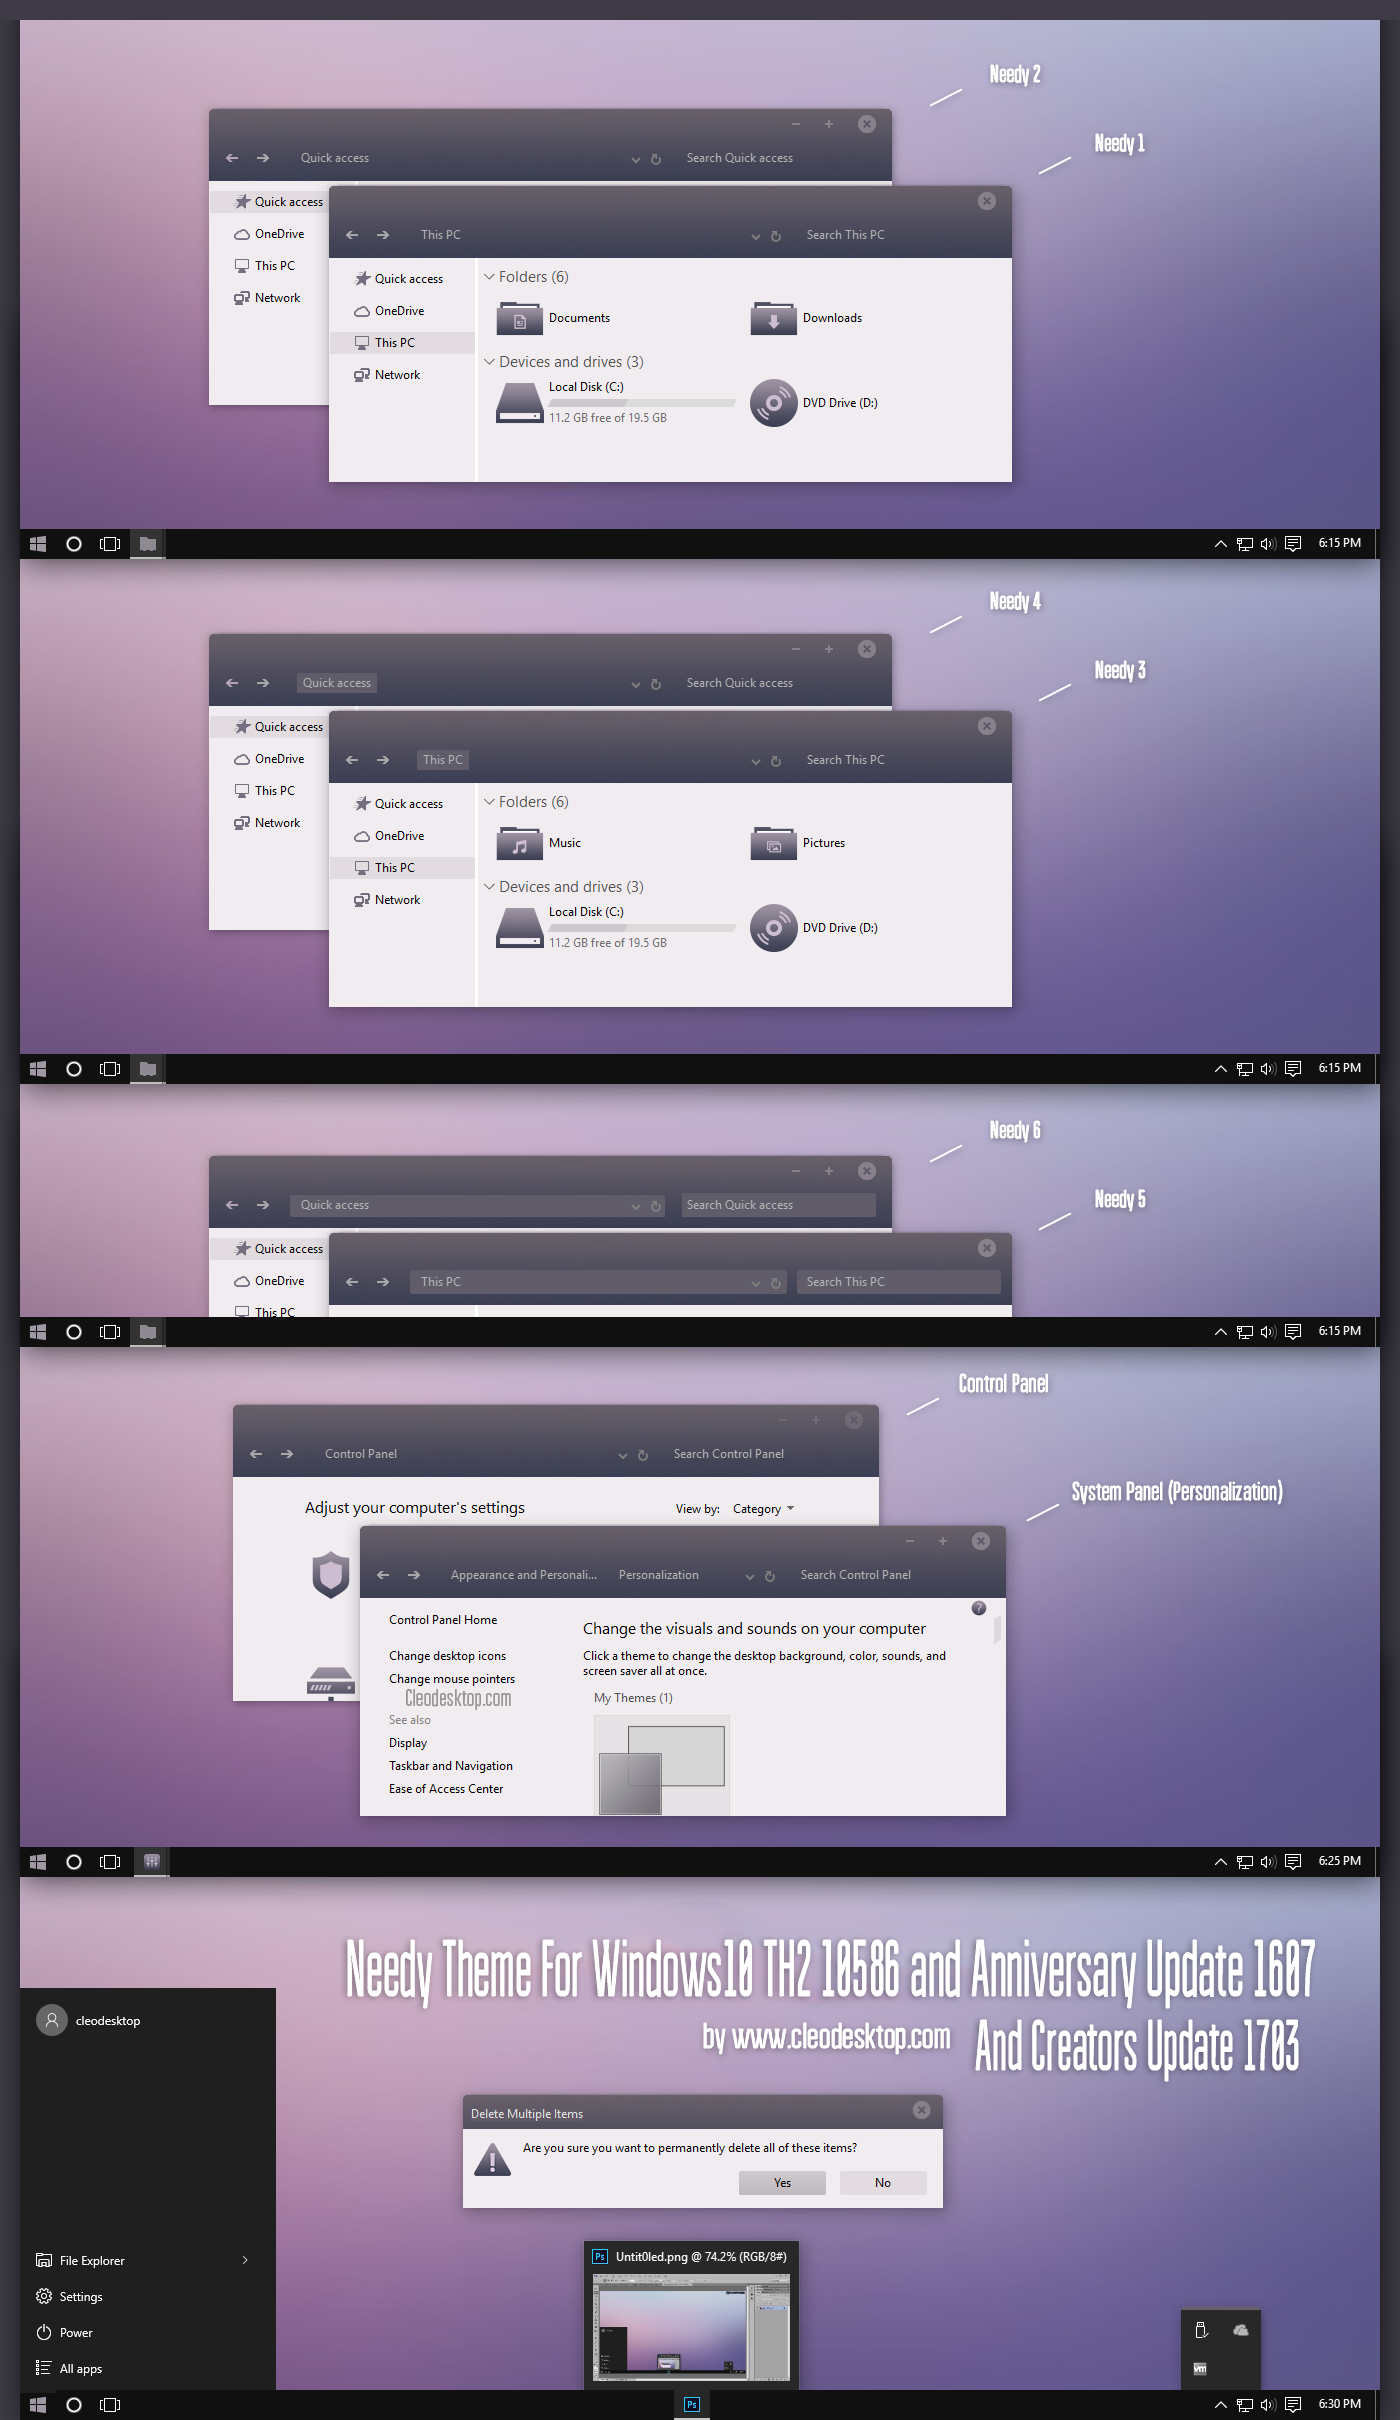 Needy Theme Win10 Creators Update by Cleodesktop